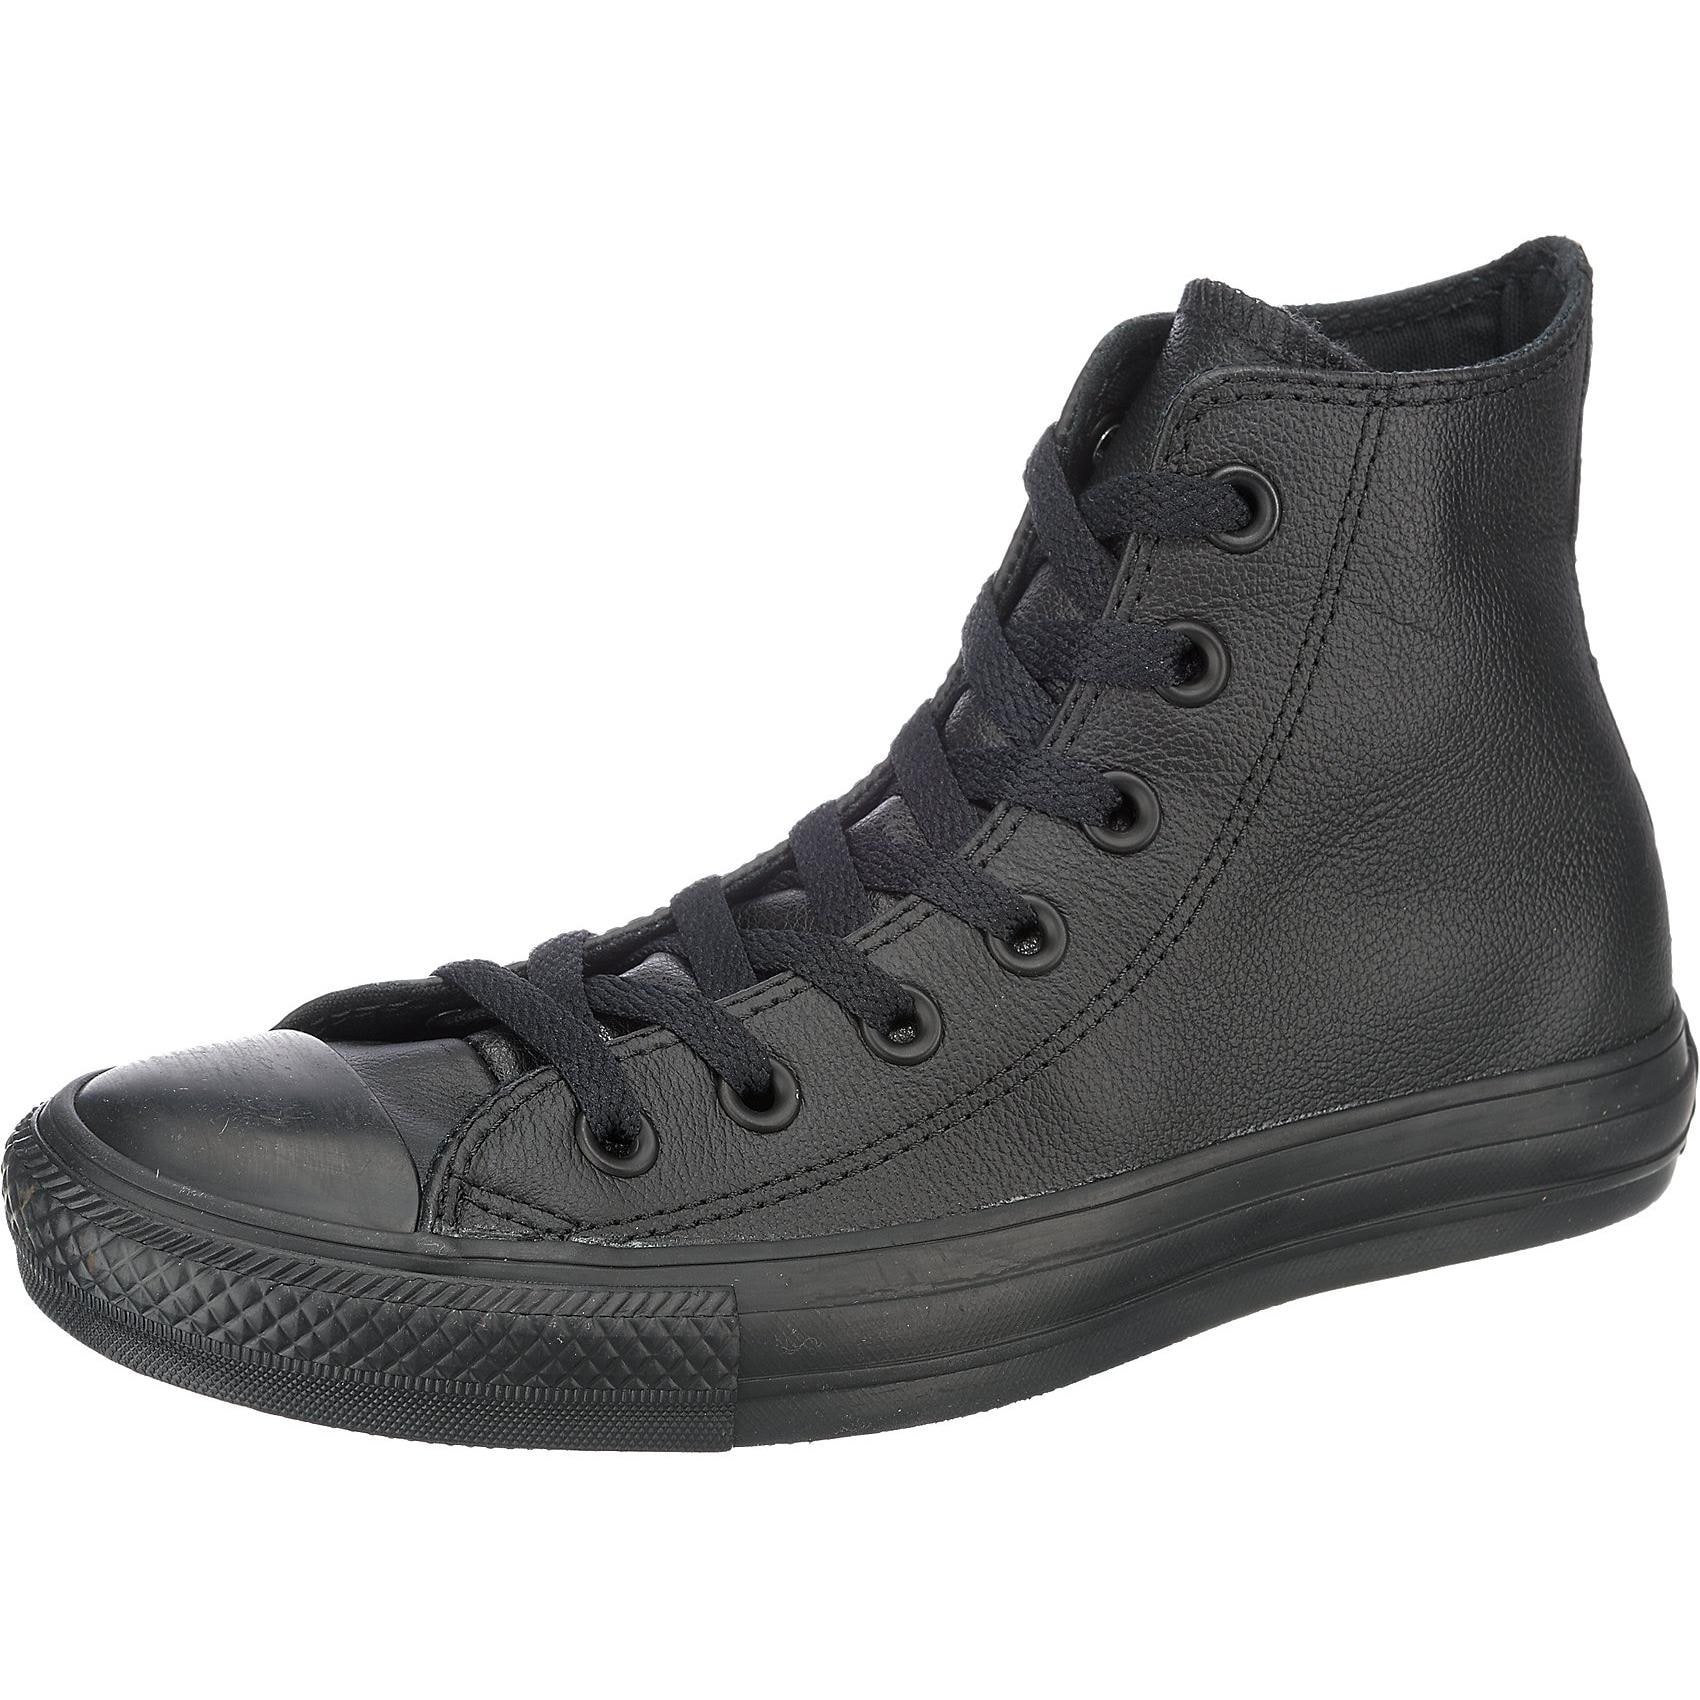 539f11dbbe07 Damen-Schuhe online bestellen » REWE